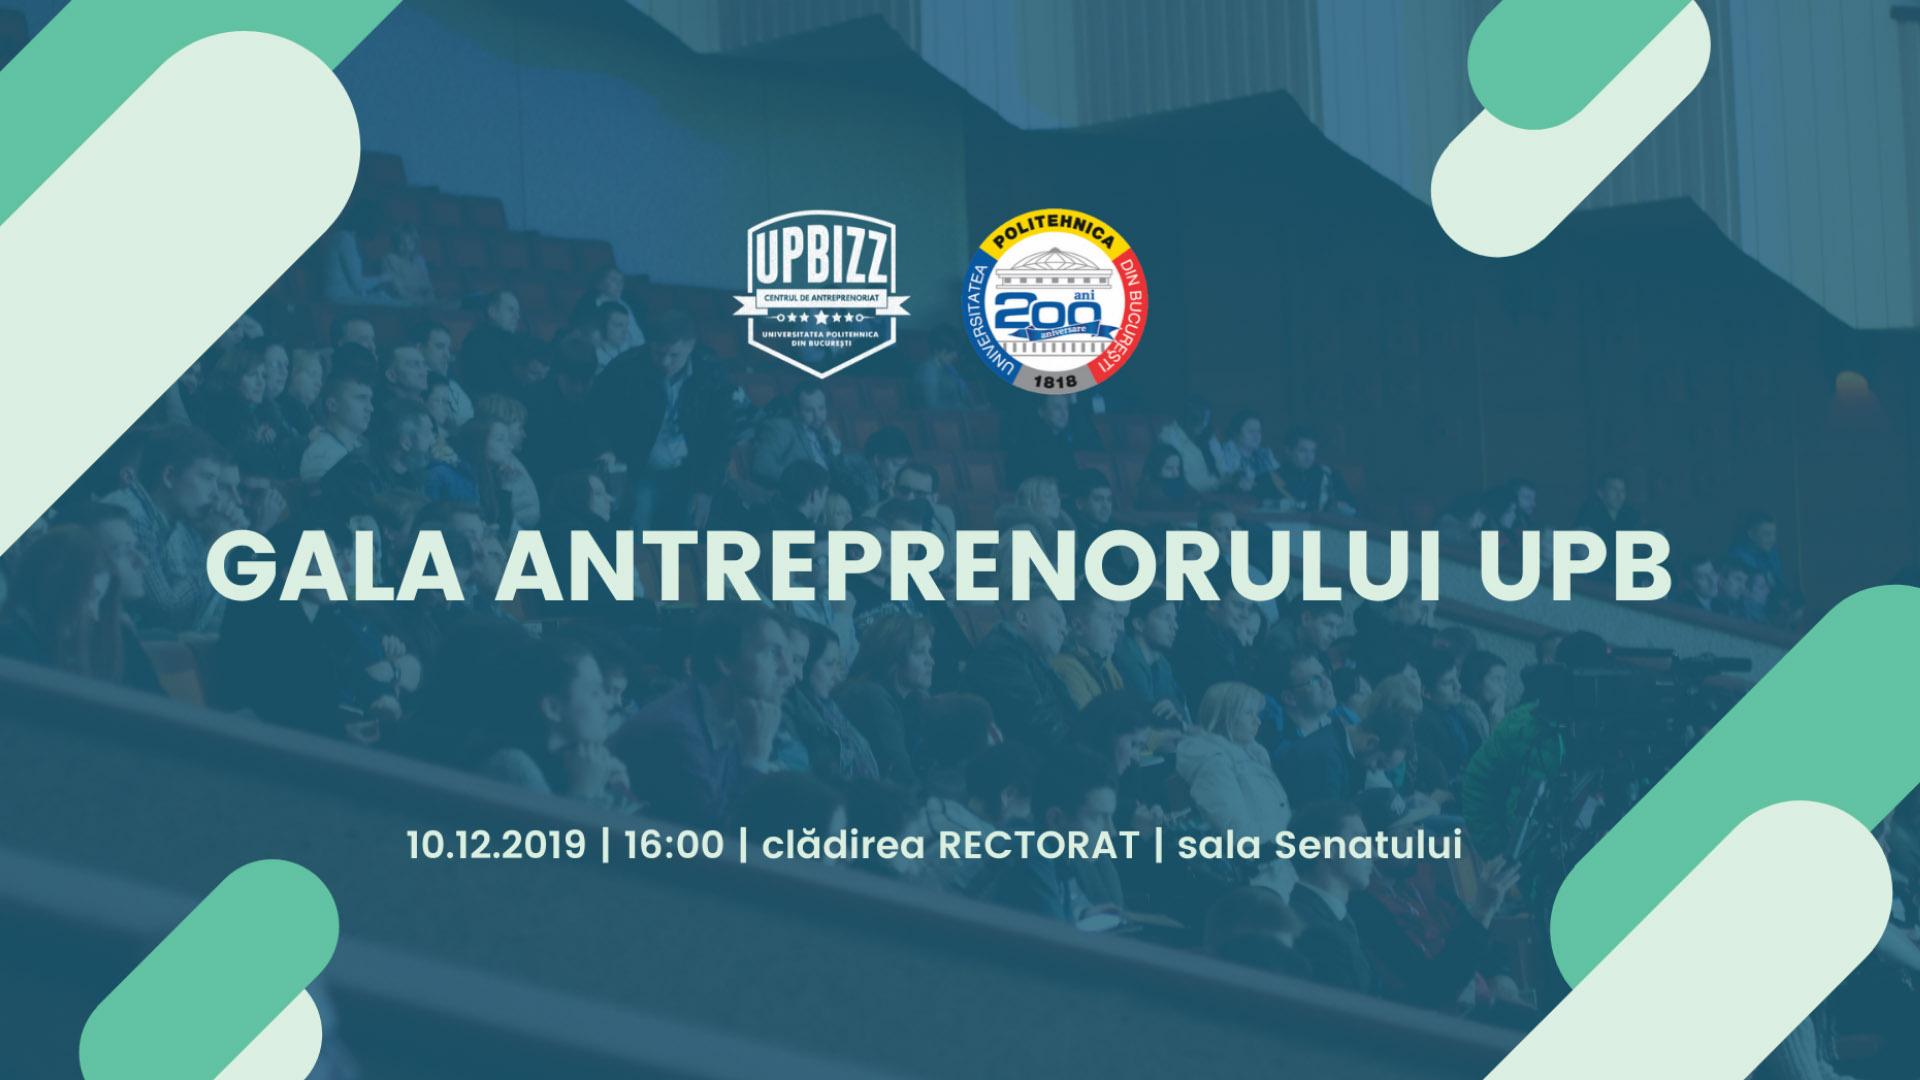 Gala Antreprenorului UPB